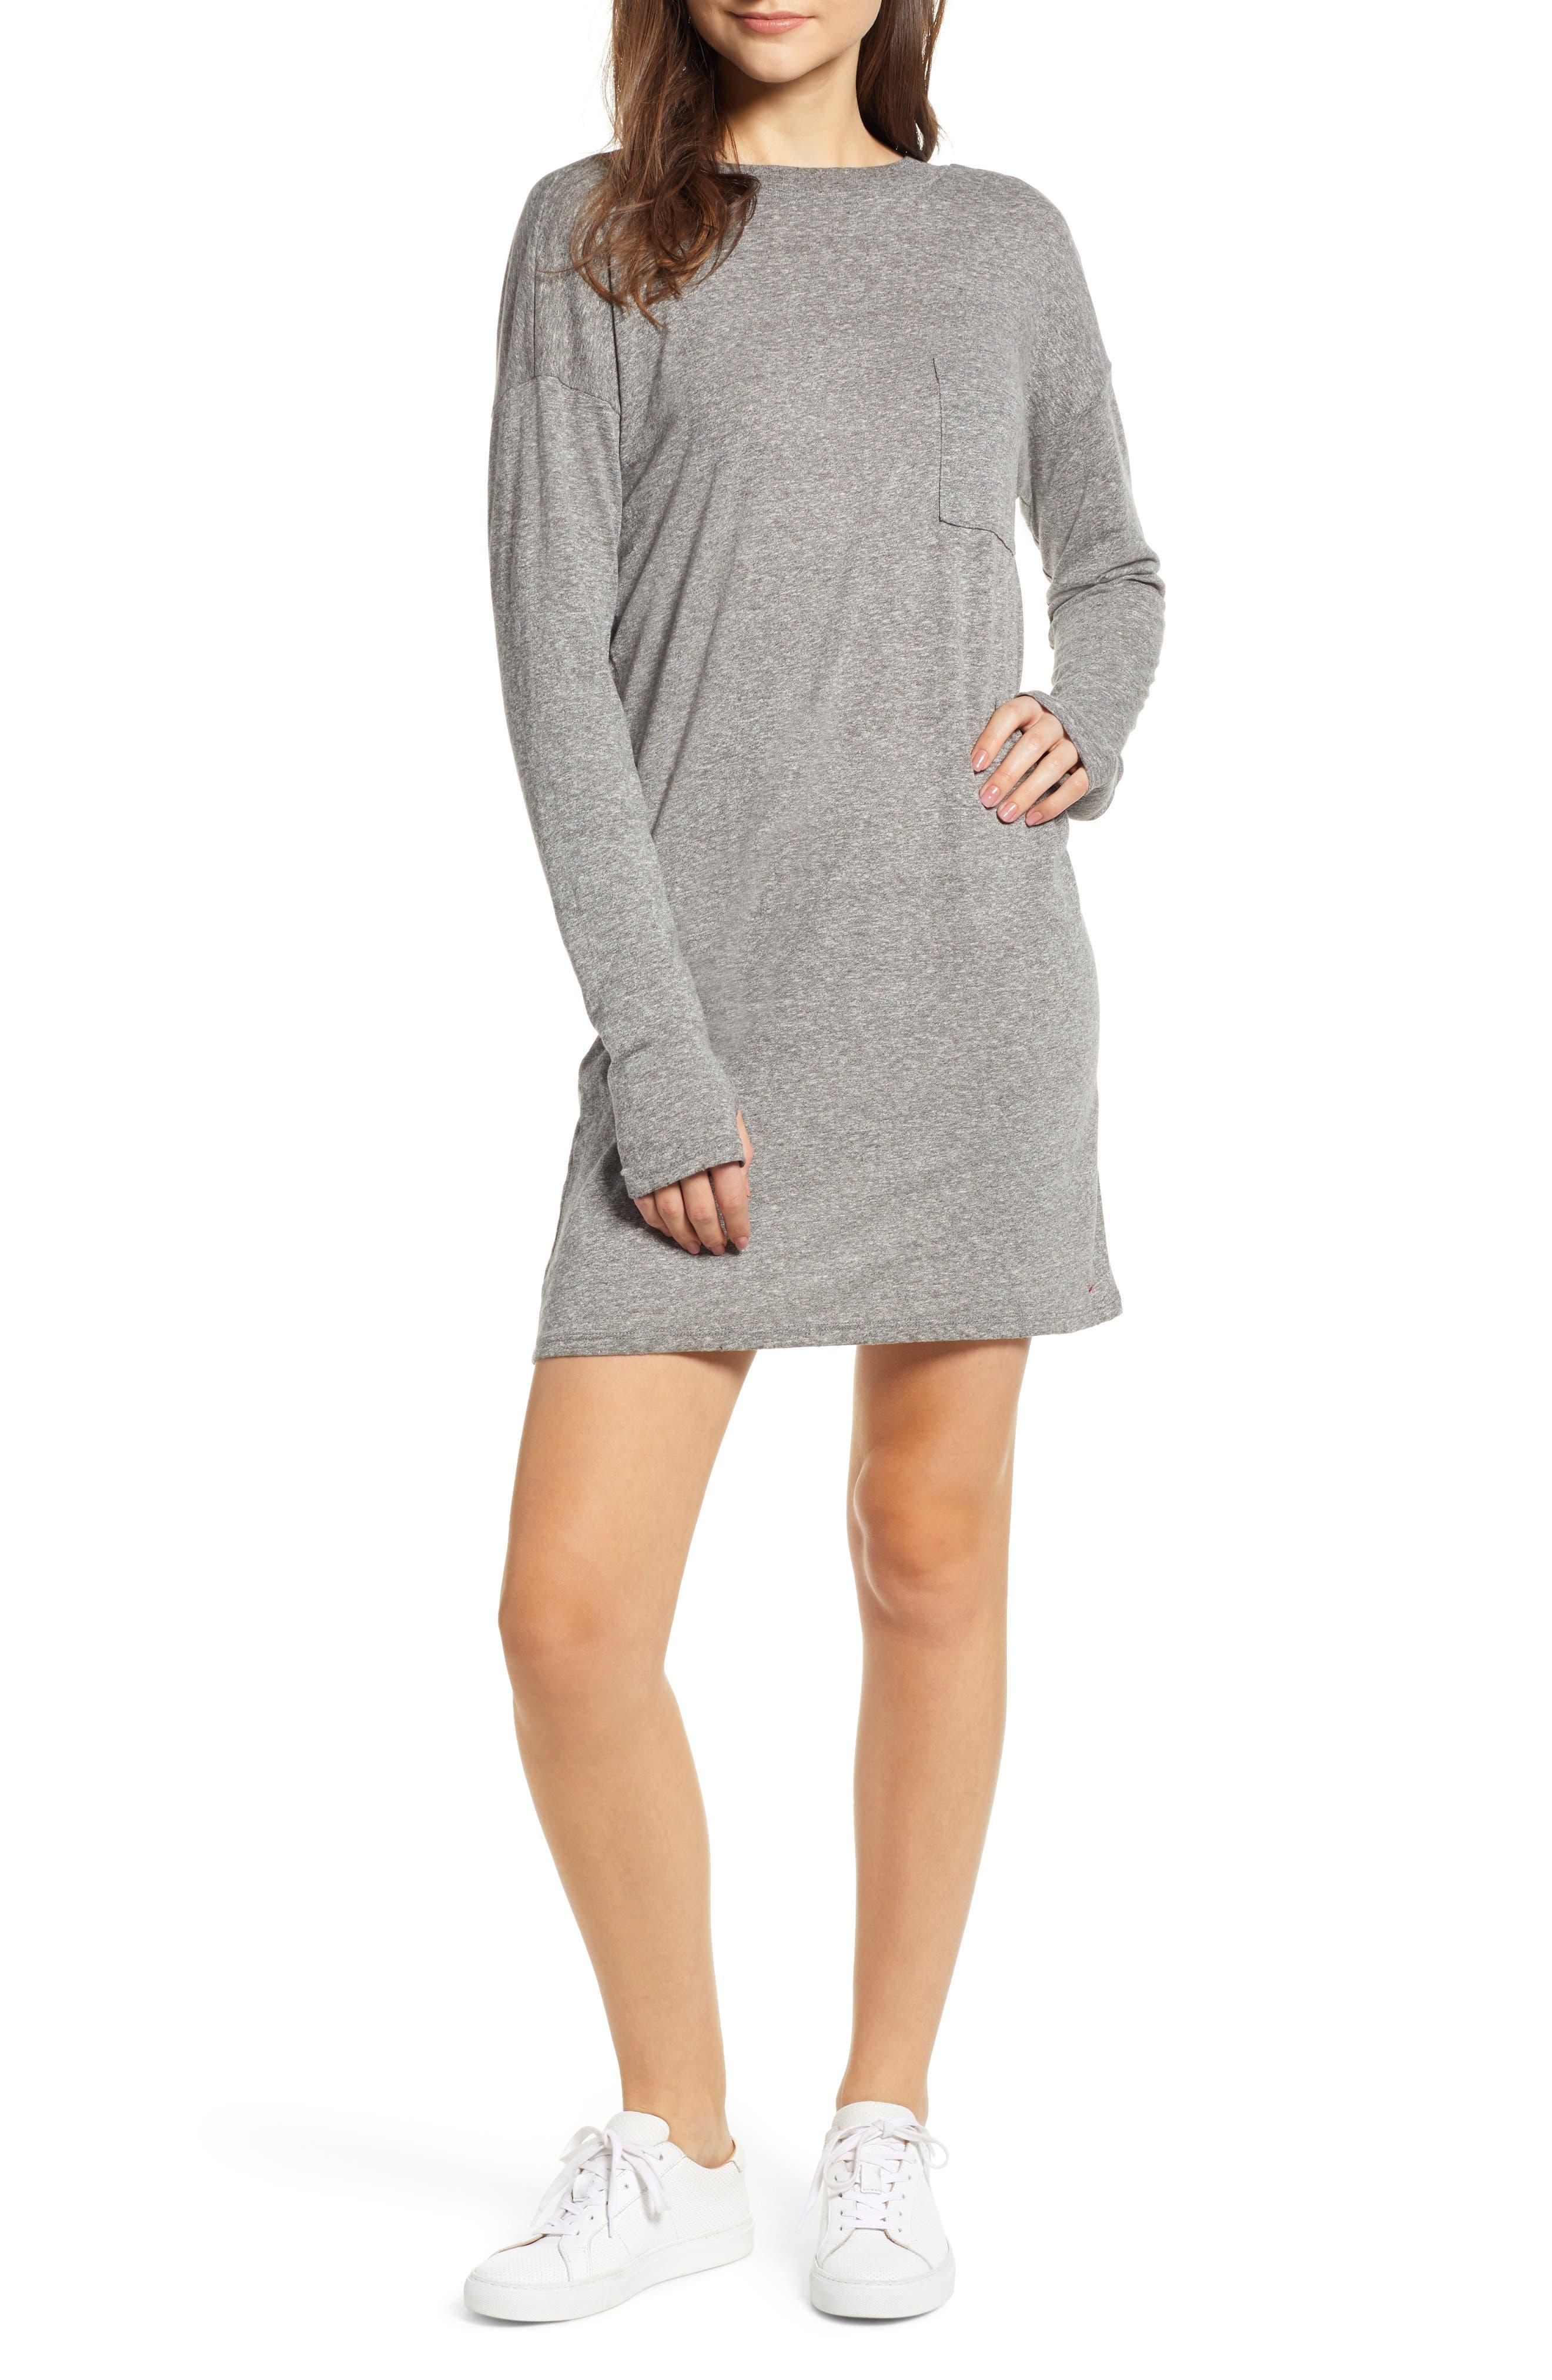 N:PHILANTHROPY Cairo Knit Dress in Heather Grey